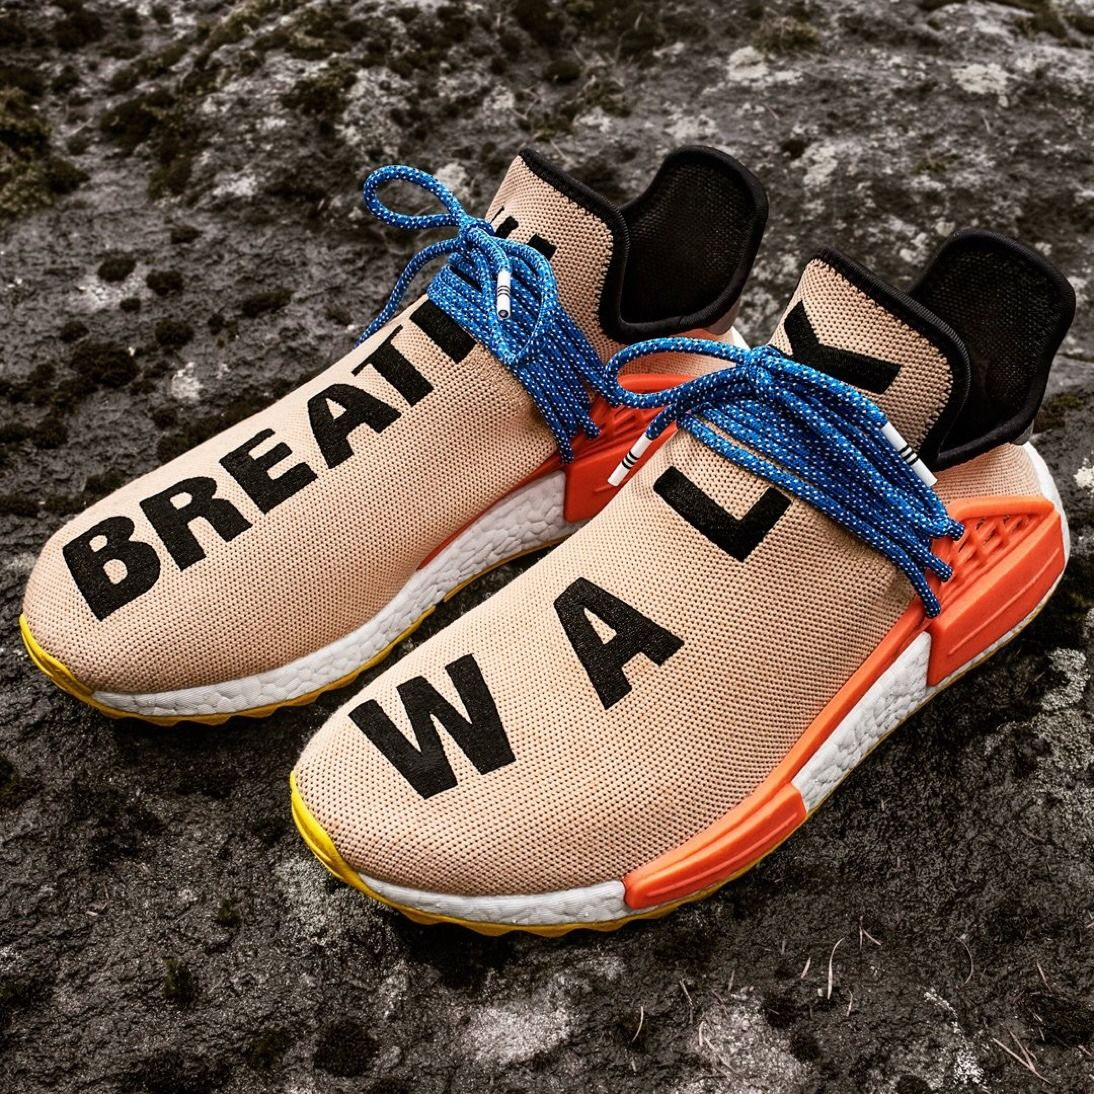 promo code d5236 86cda Adidas NMD x Pharrell PW Human Race by blog.sneakerando.com sneakers  sneakernews StreetStyle Kicks adidas nike vans newbalance puma ADIDAS ASICS  CONVERSE ...